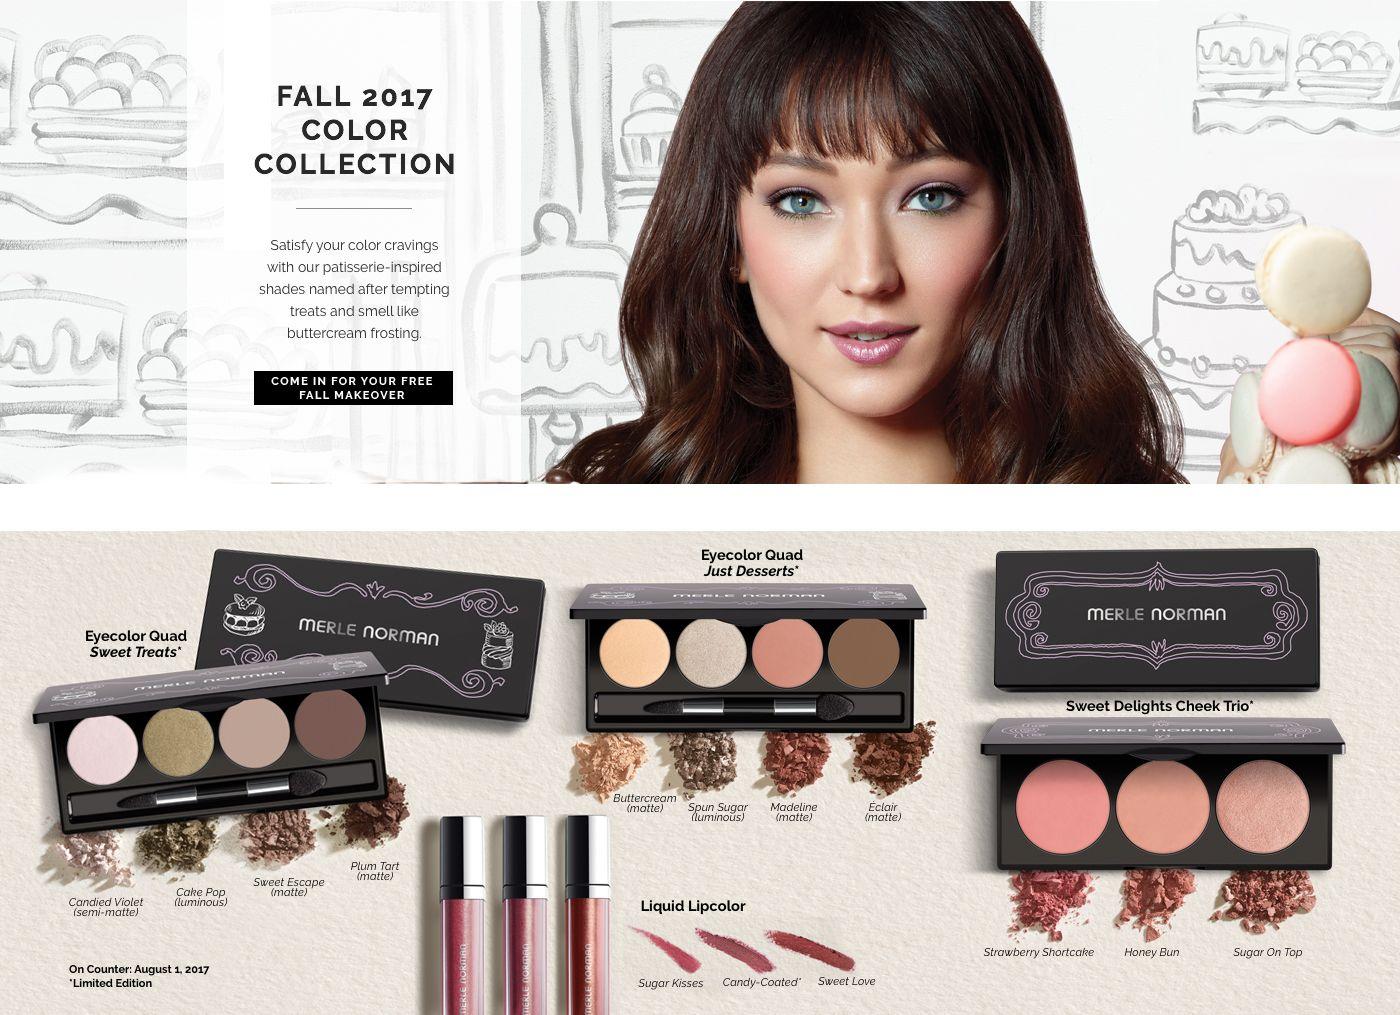 Shadow Stack Daydreams Merle norman makeup, Color